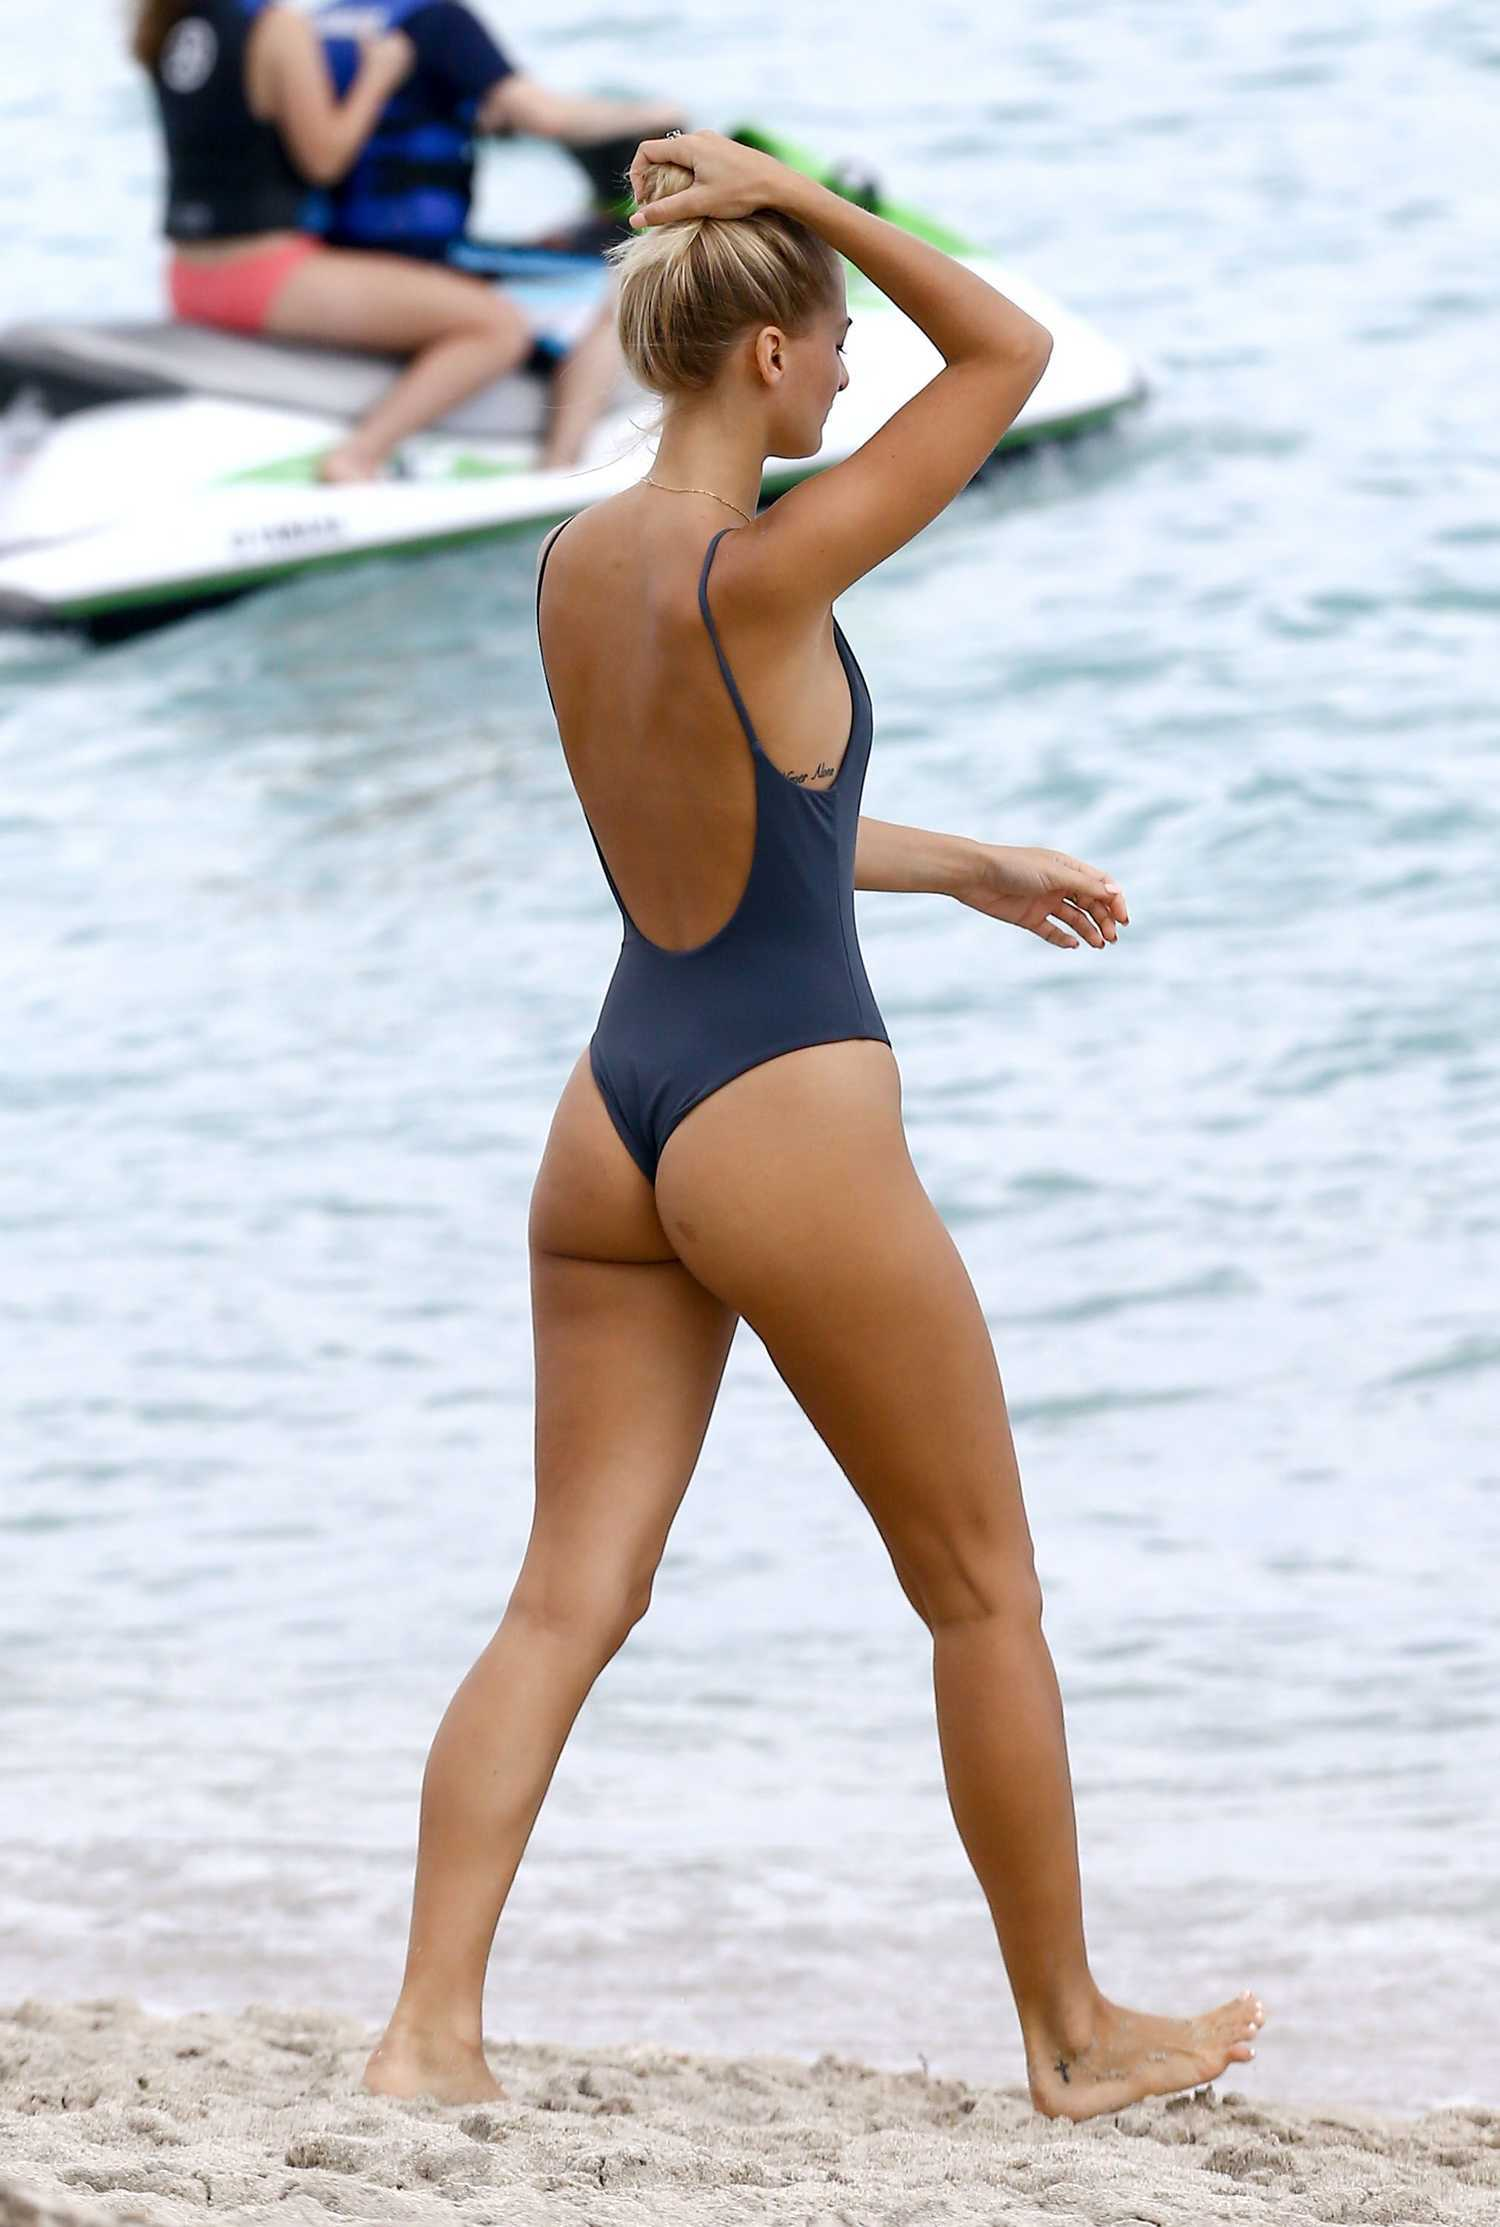 montenegro girl nude